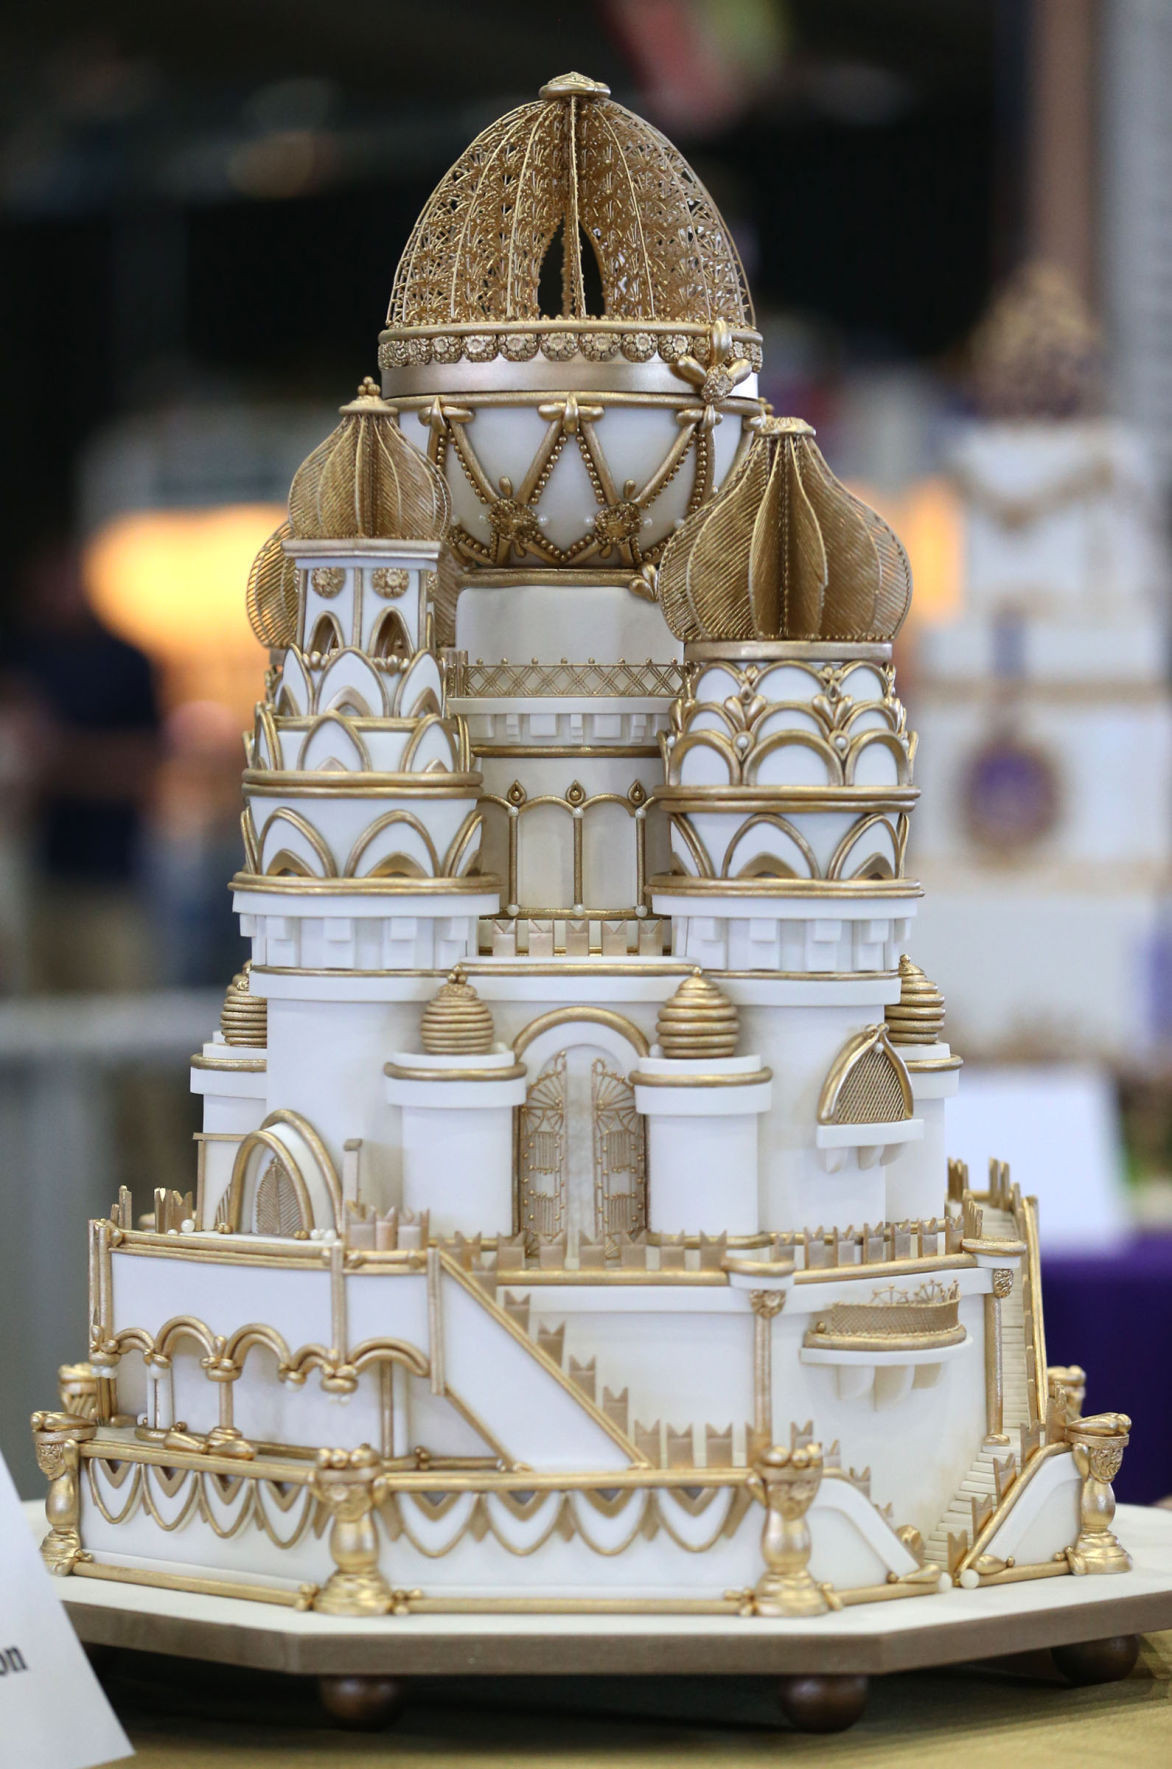 Wedding Cakes Tulsa Ok  Wedding dress cake earns top honors at Grand National